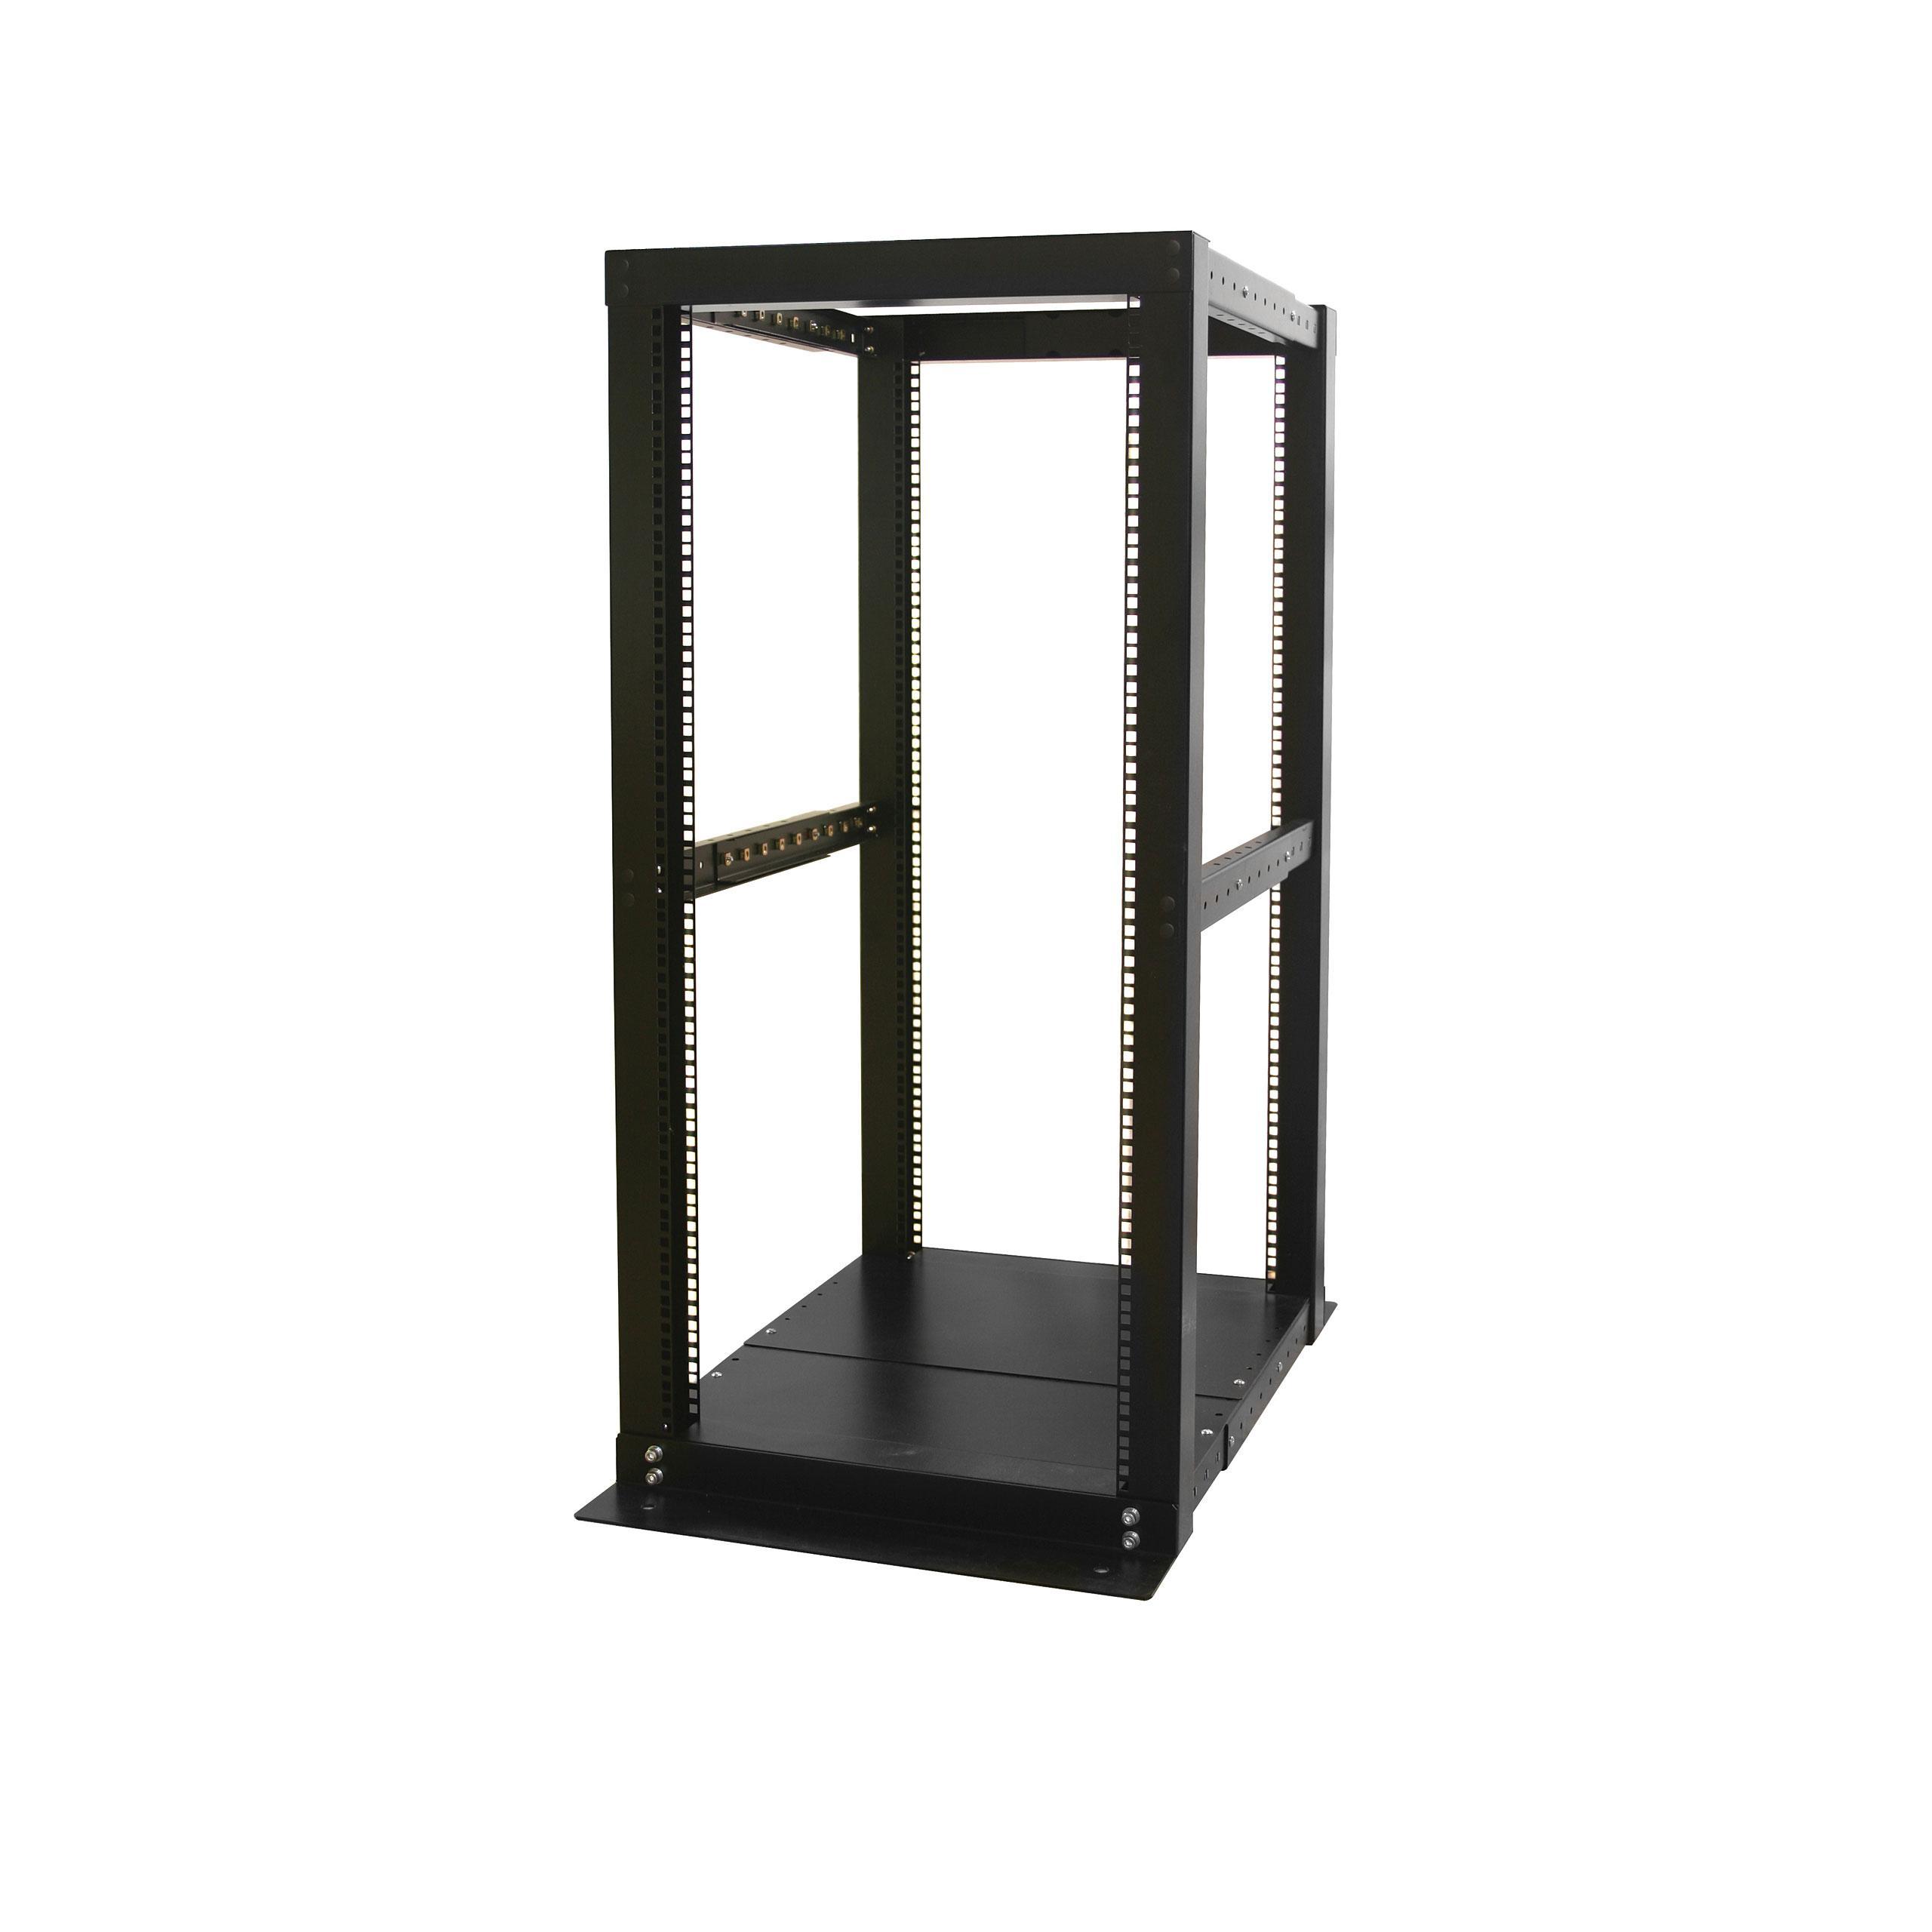 Amazon.com: StarTech 4POSTRACK25 25U 4 Post Server Open Frame Rack ...